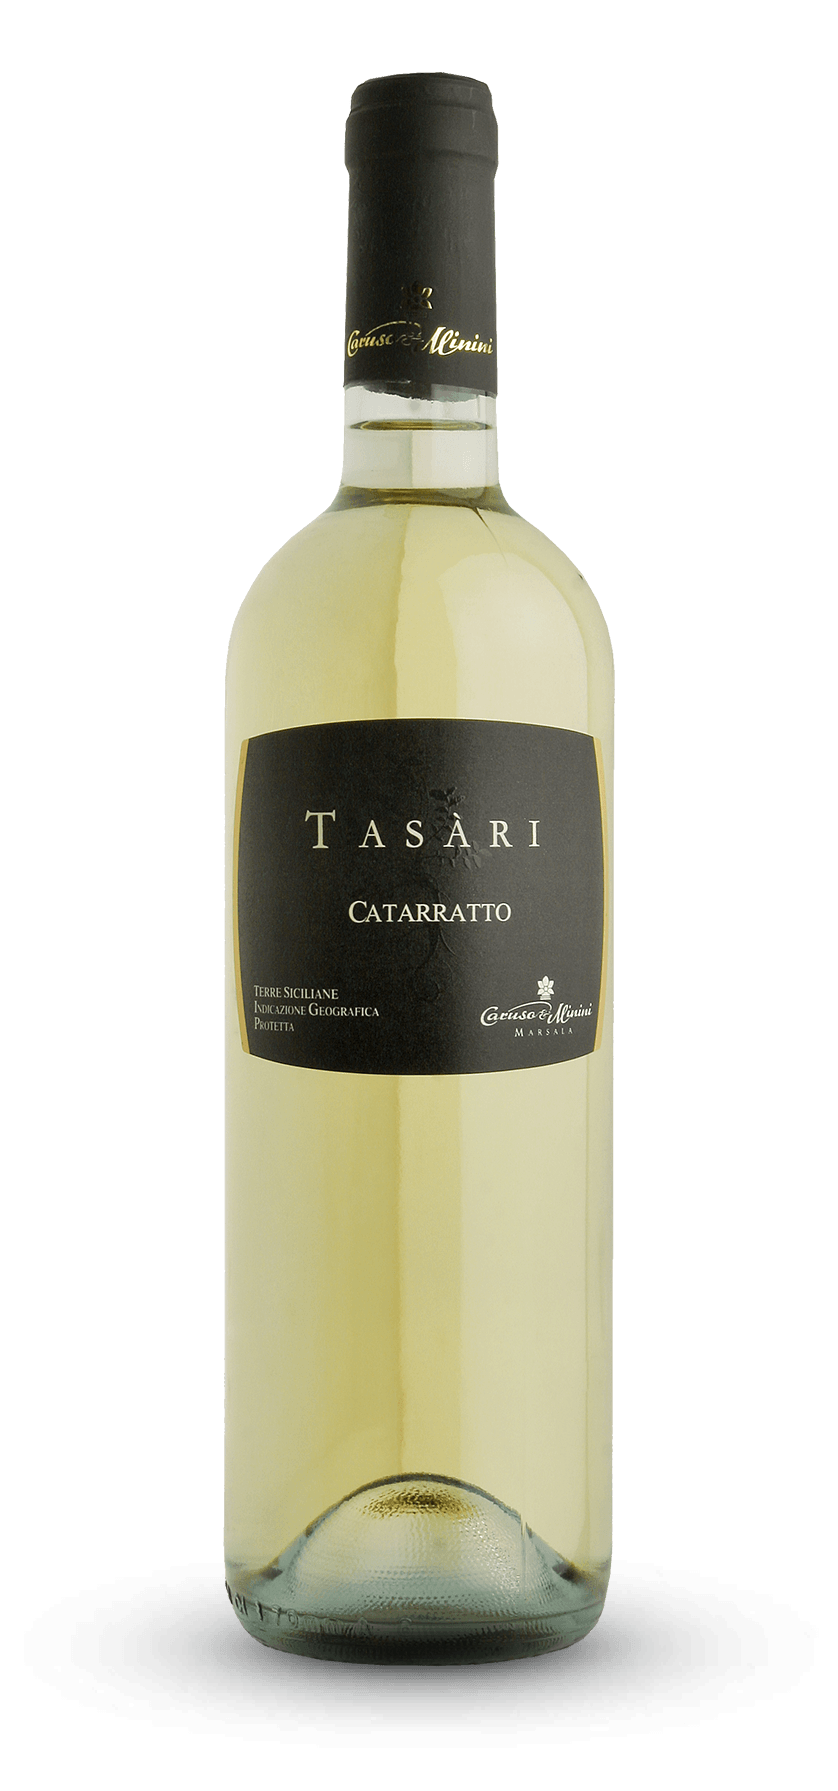 Tasari Catarratto Terre Siciliane IGP   Sicitaly